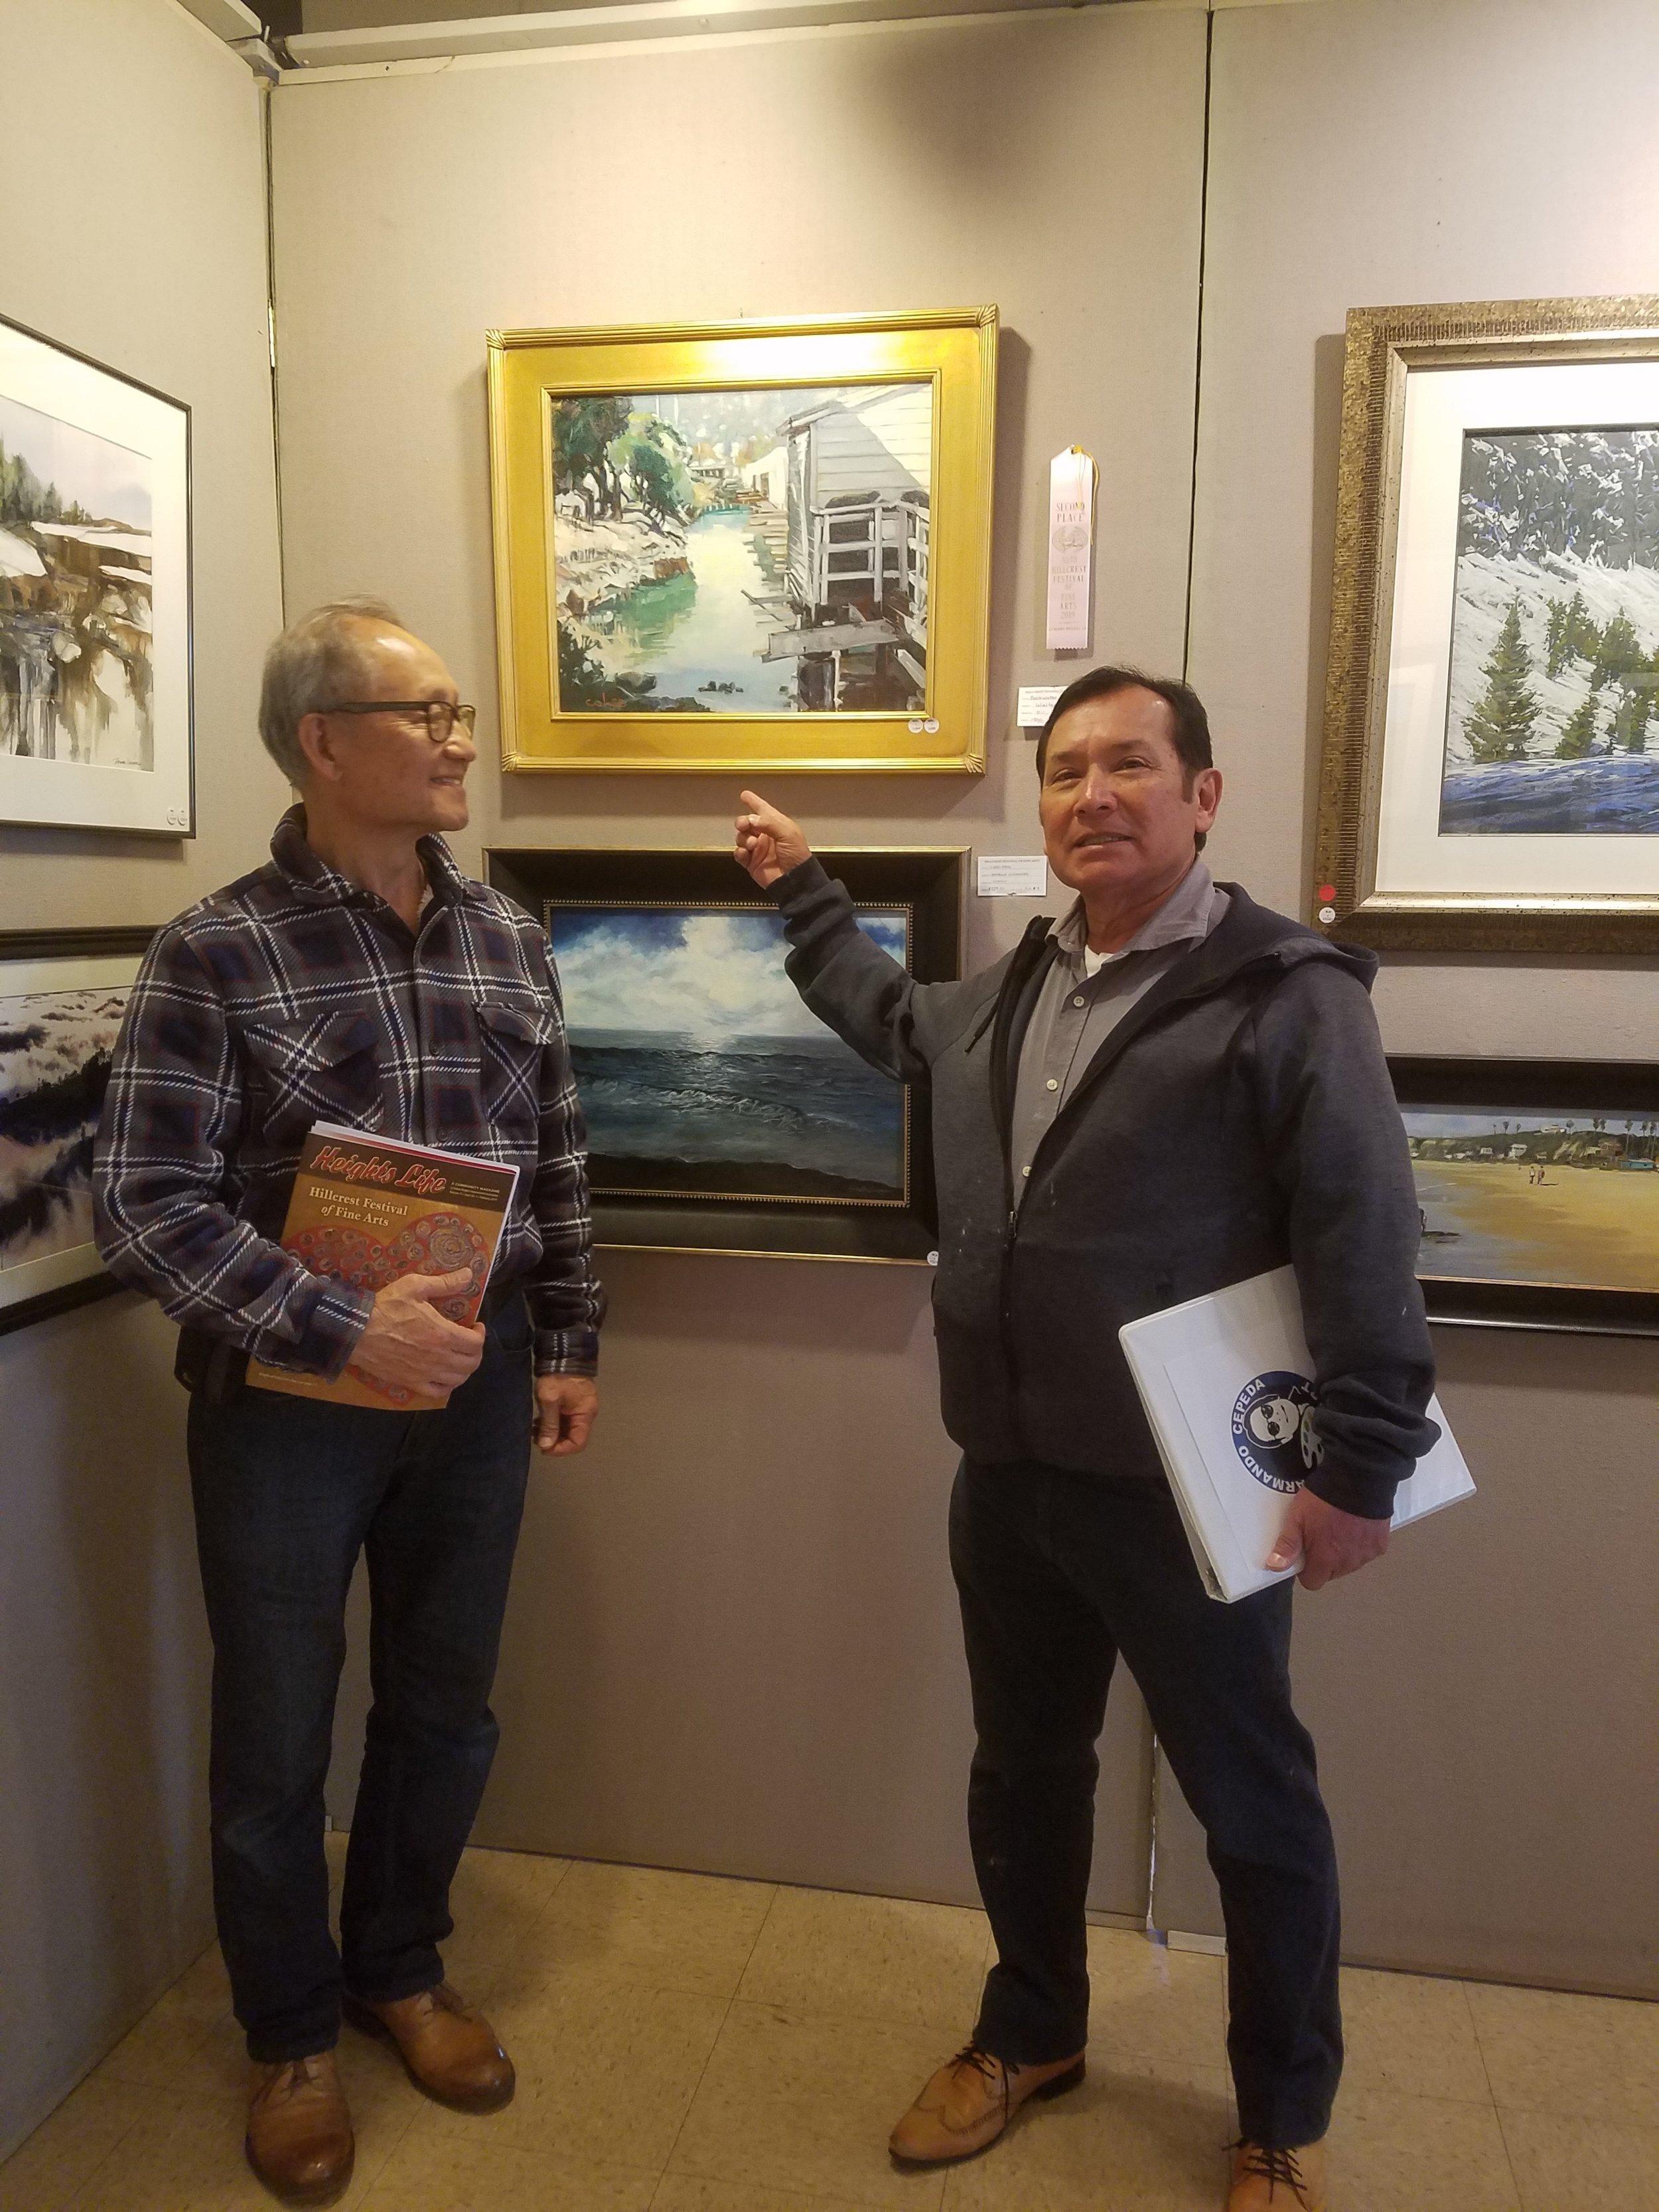 With a fellow artist Armando Cepeda (President of Placentia-Yorba Linda Art Association).